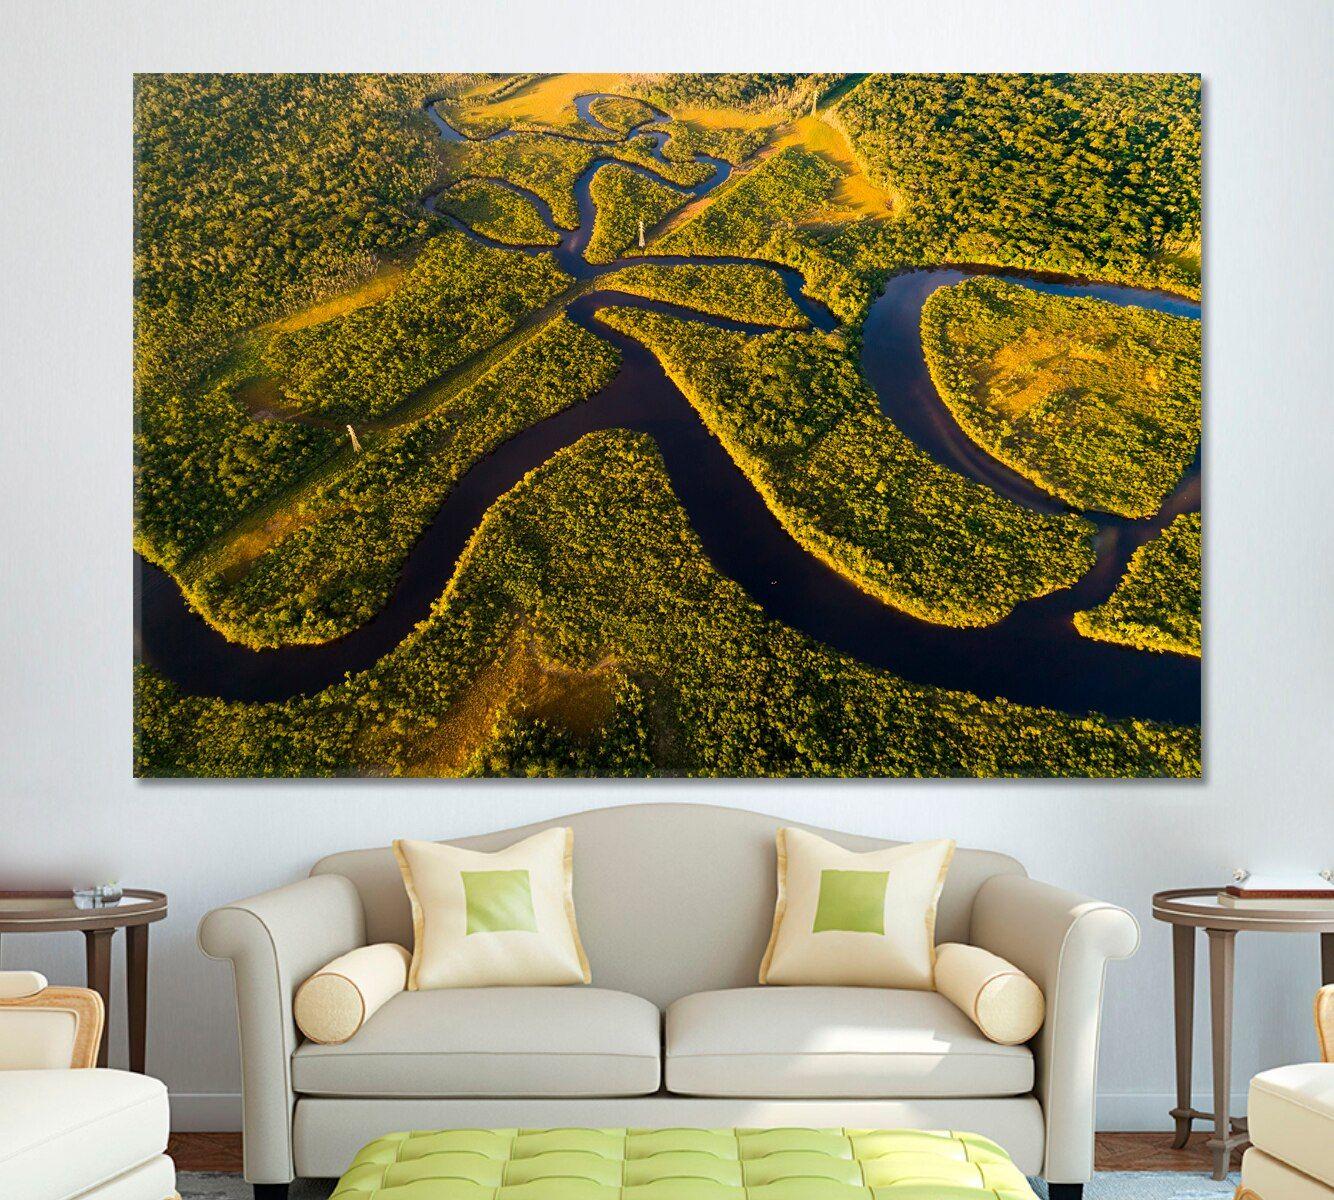 Amazon Rainforest In Brazil Amazon Rainforest Canvas Prints